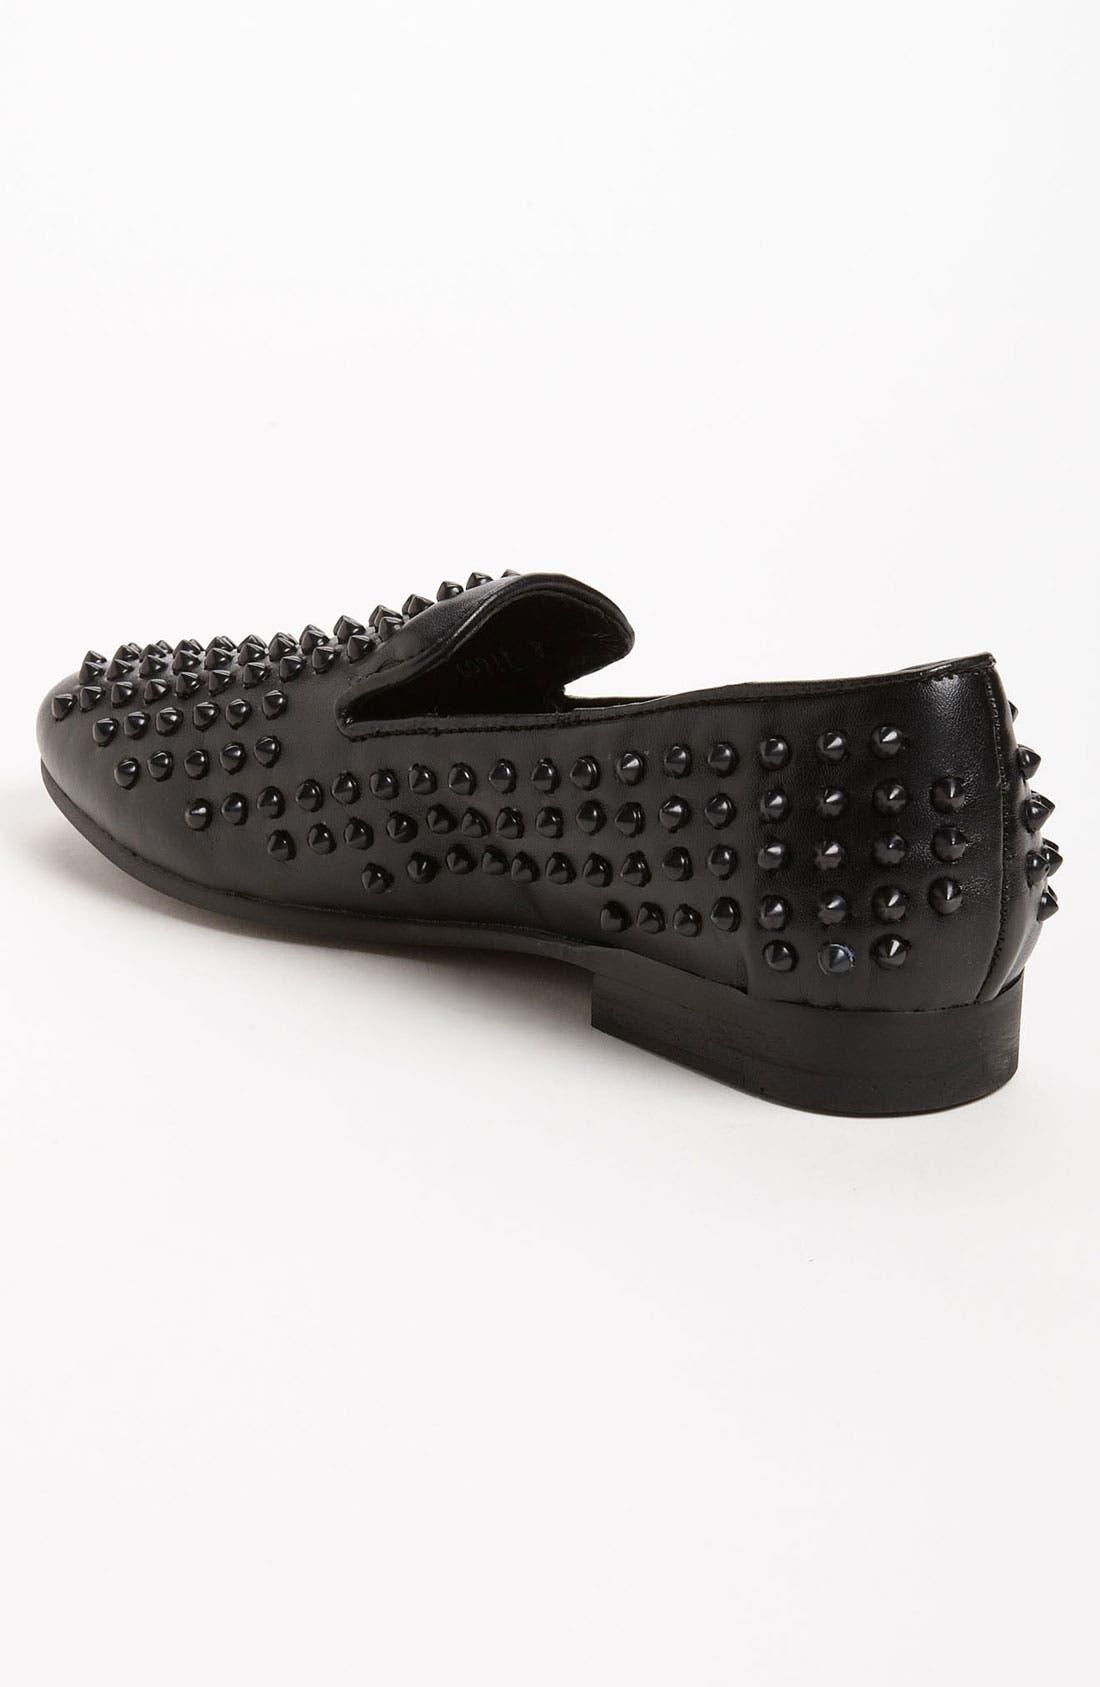 Alternate Image 2  - Steve Madden 'Jagggrr' Studded Loafer